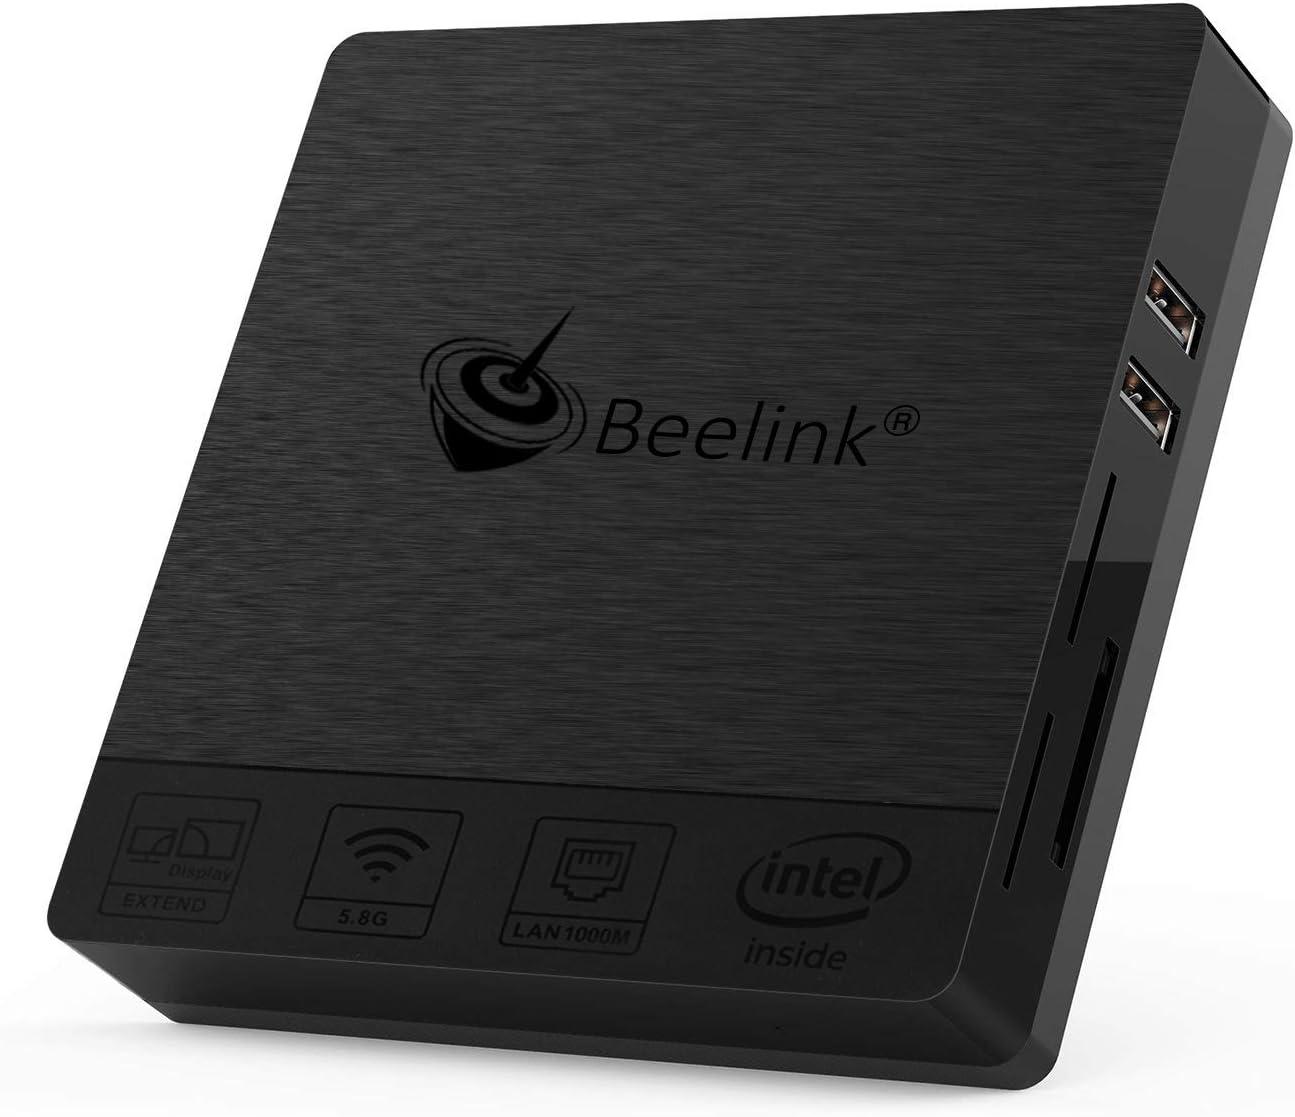 Mini PC - Pc Computer (Intel Apollo Lake, HD Graphics, Gigabit/Bluetooth/Dual-Band/WiFi, Mini PC Windows 10) Mini PC Intel, Mini Computer